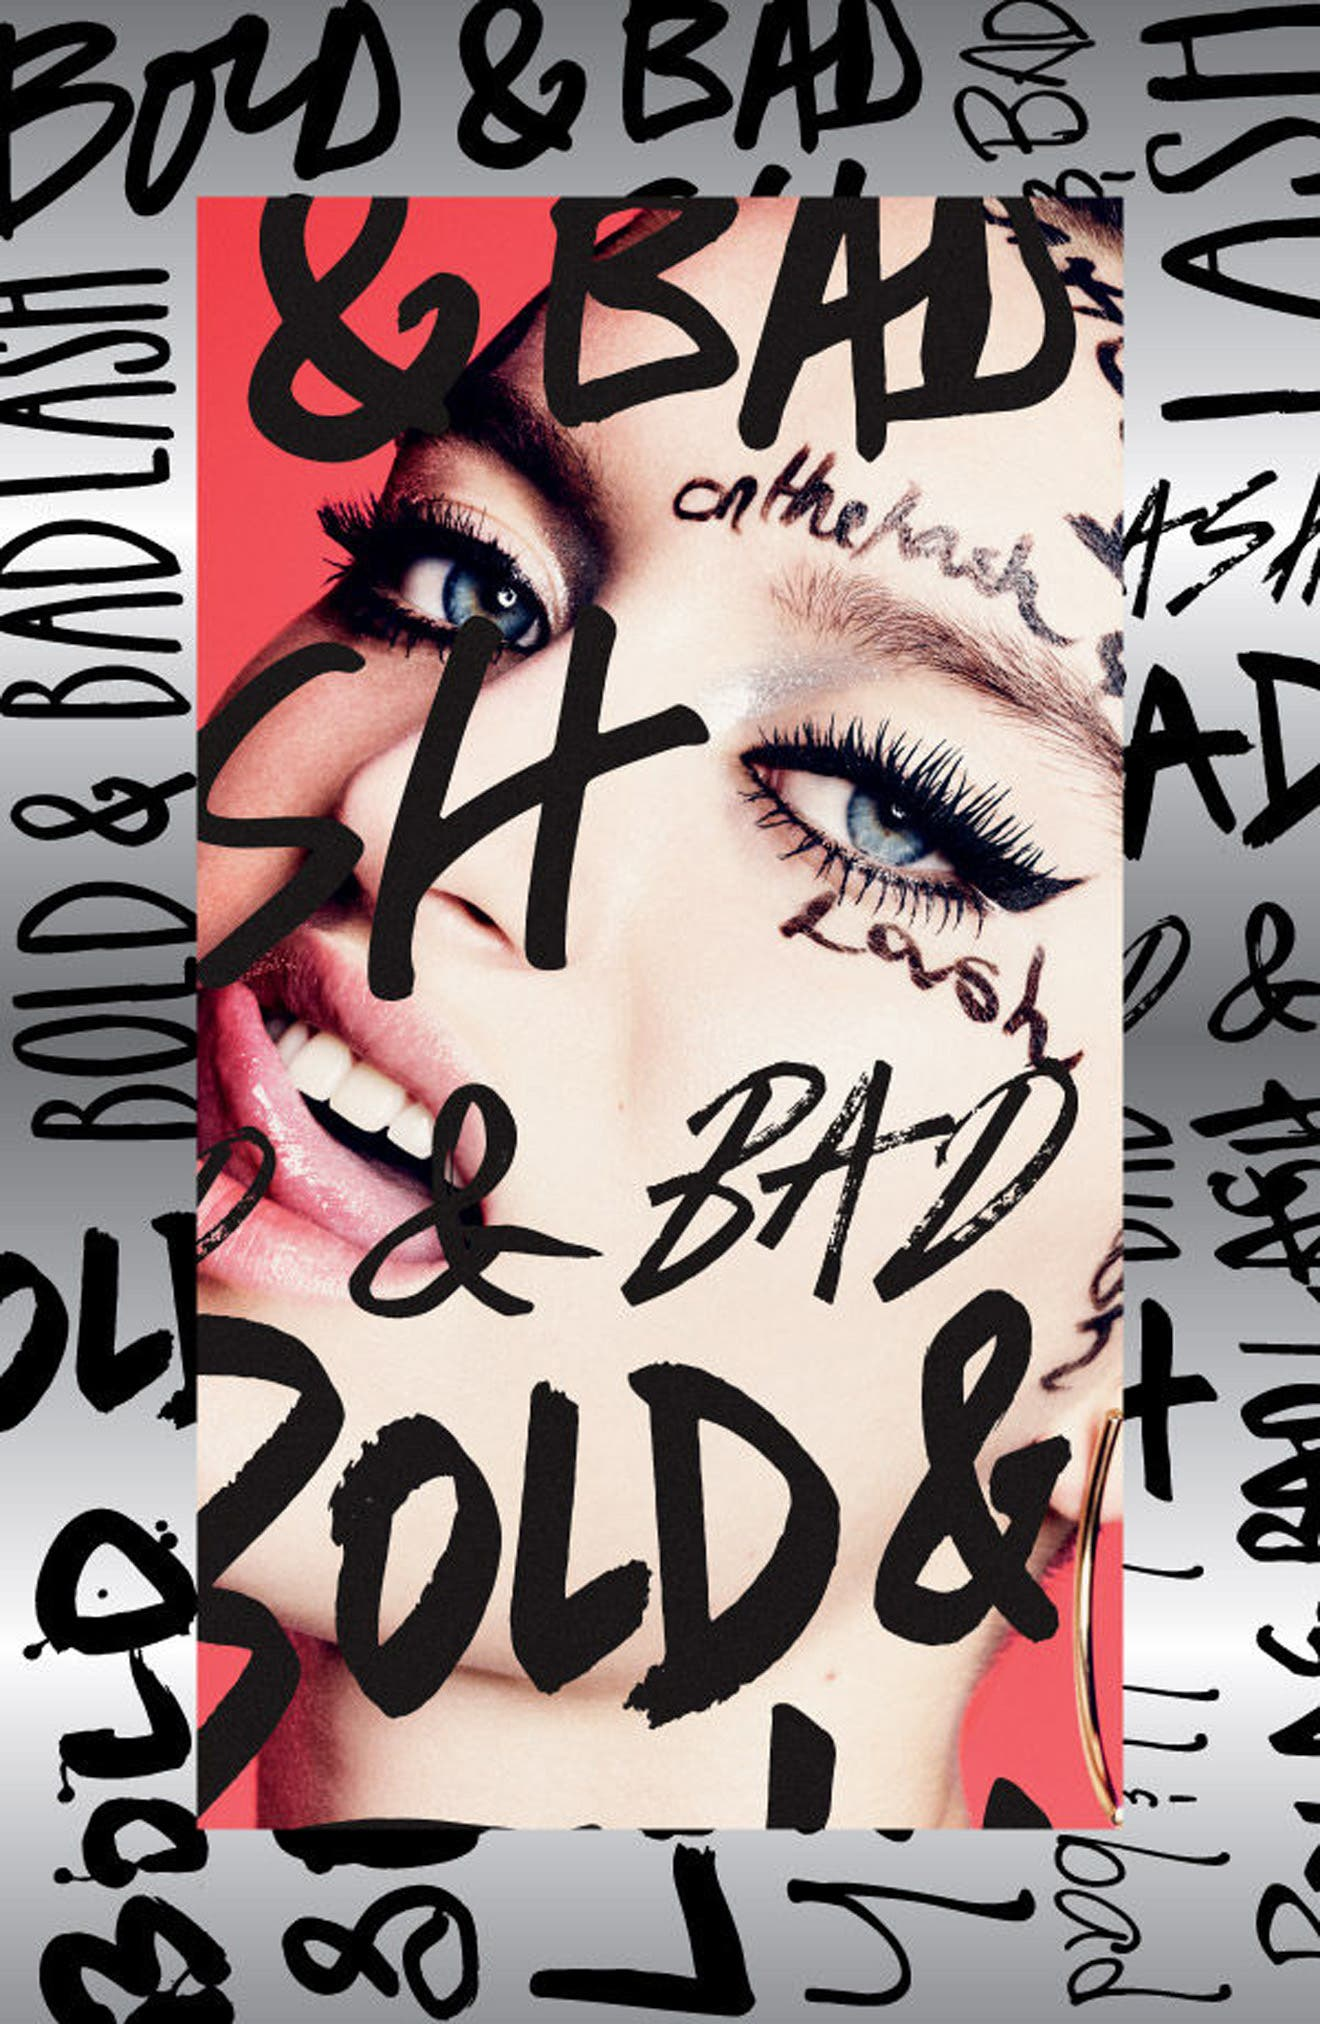 MAC Bold & Bad Lash Mascara,                             Alternate thumbnail 3, color,                             BOLD BAD BLACK